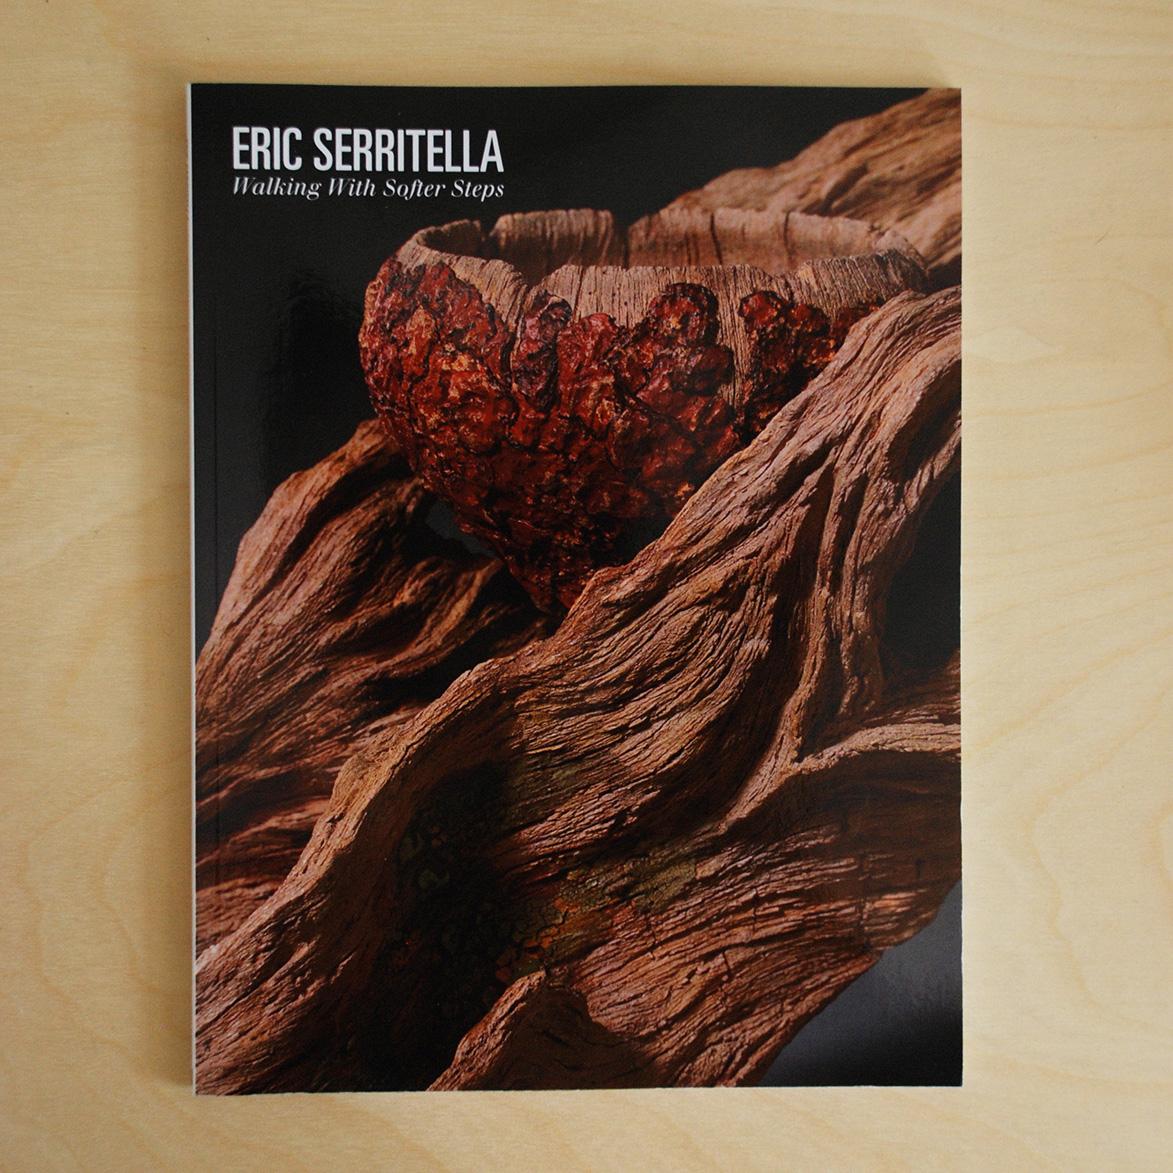 Eric Serritella: Walking With Softer Steps Catalog design